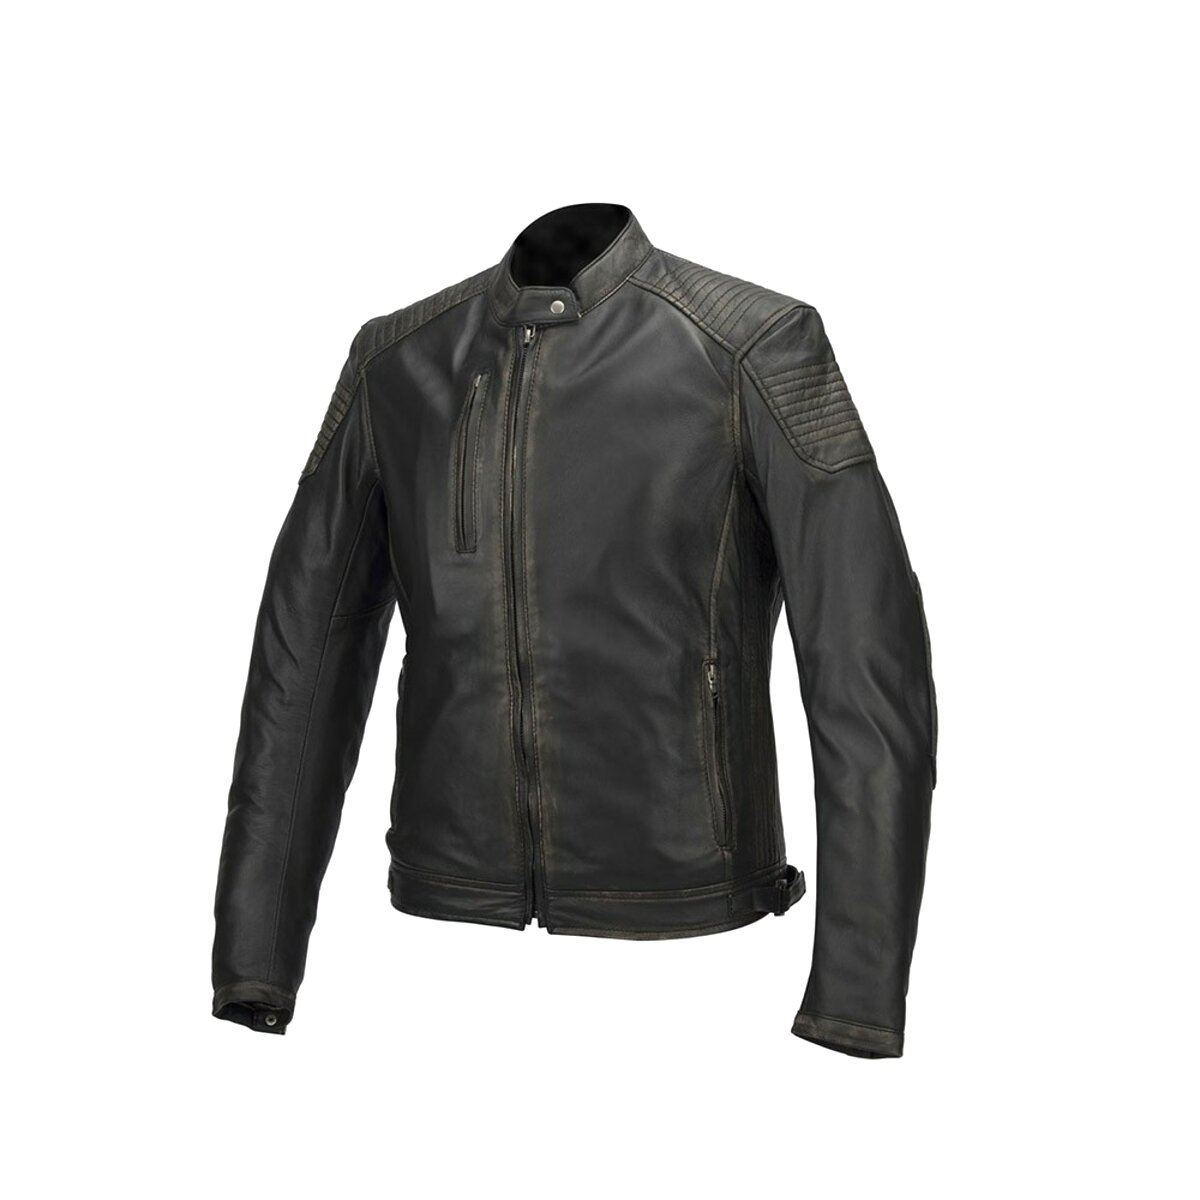 giubbino pelle giacca moto usato